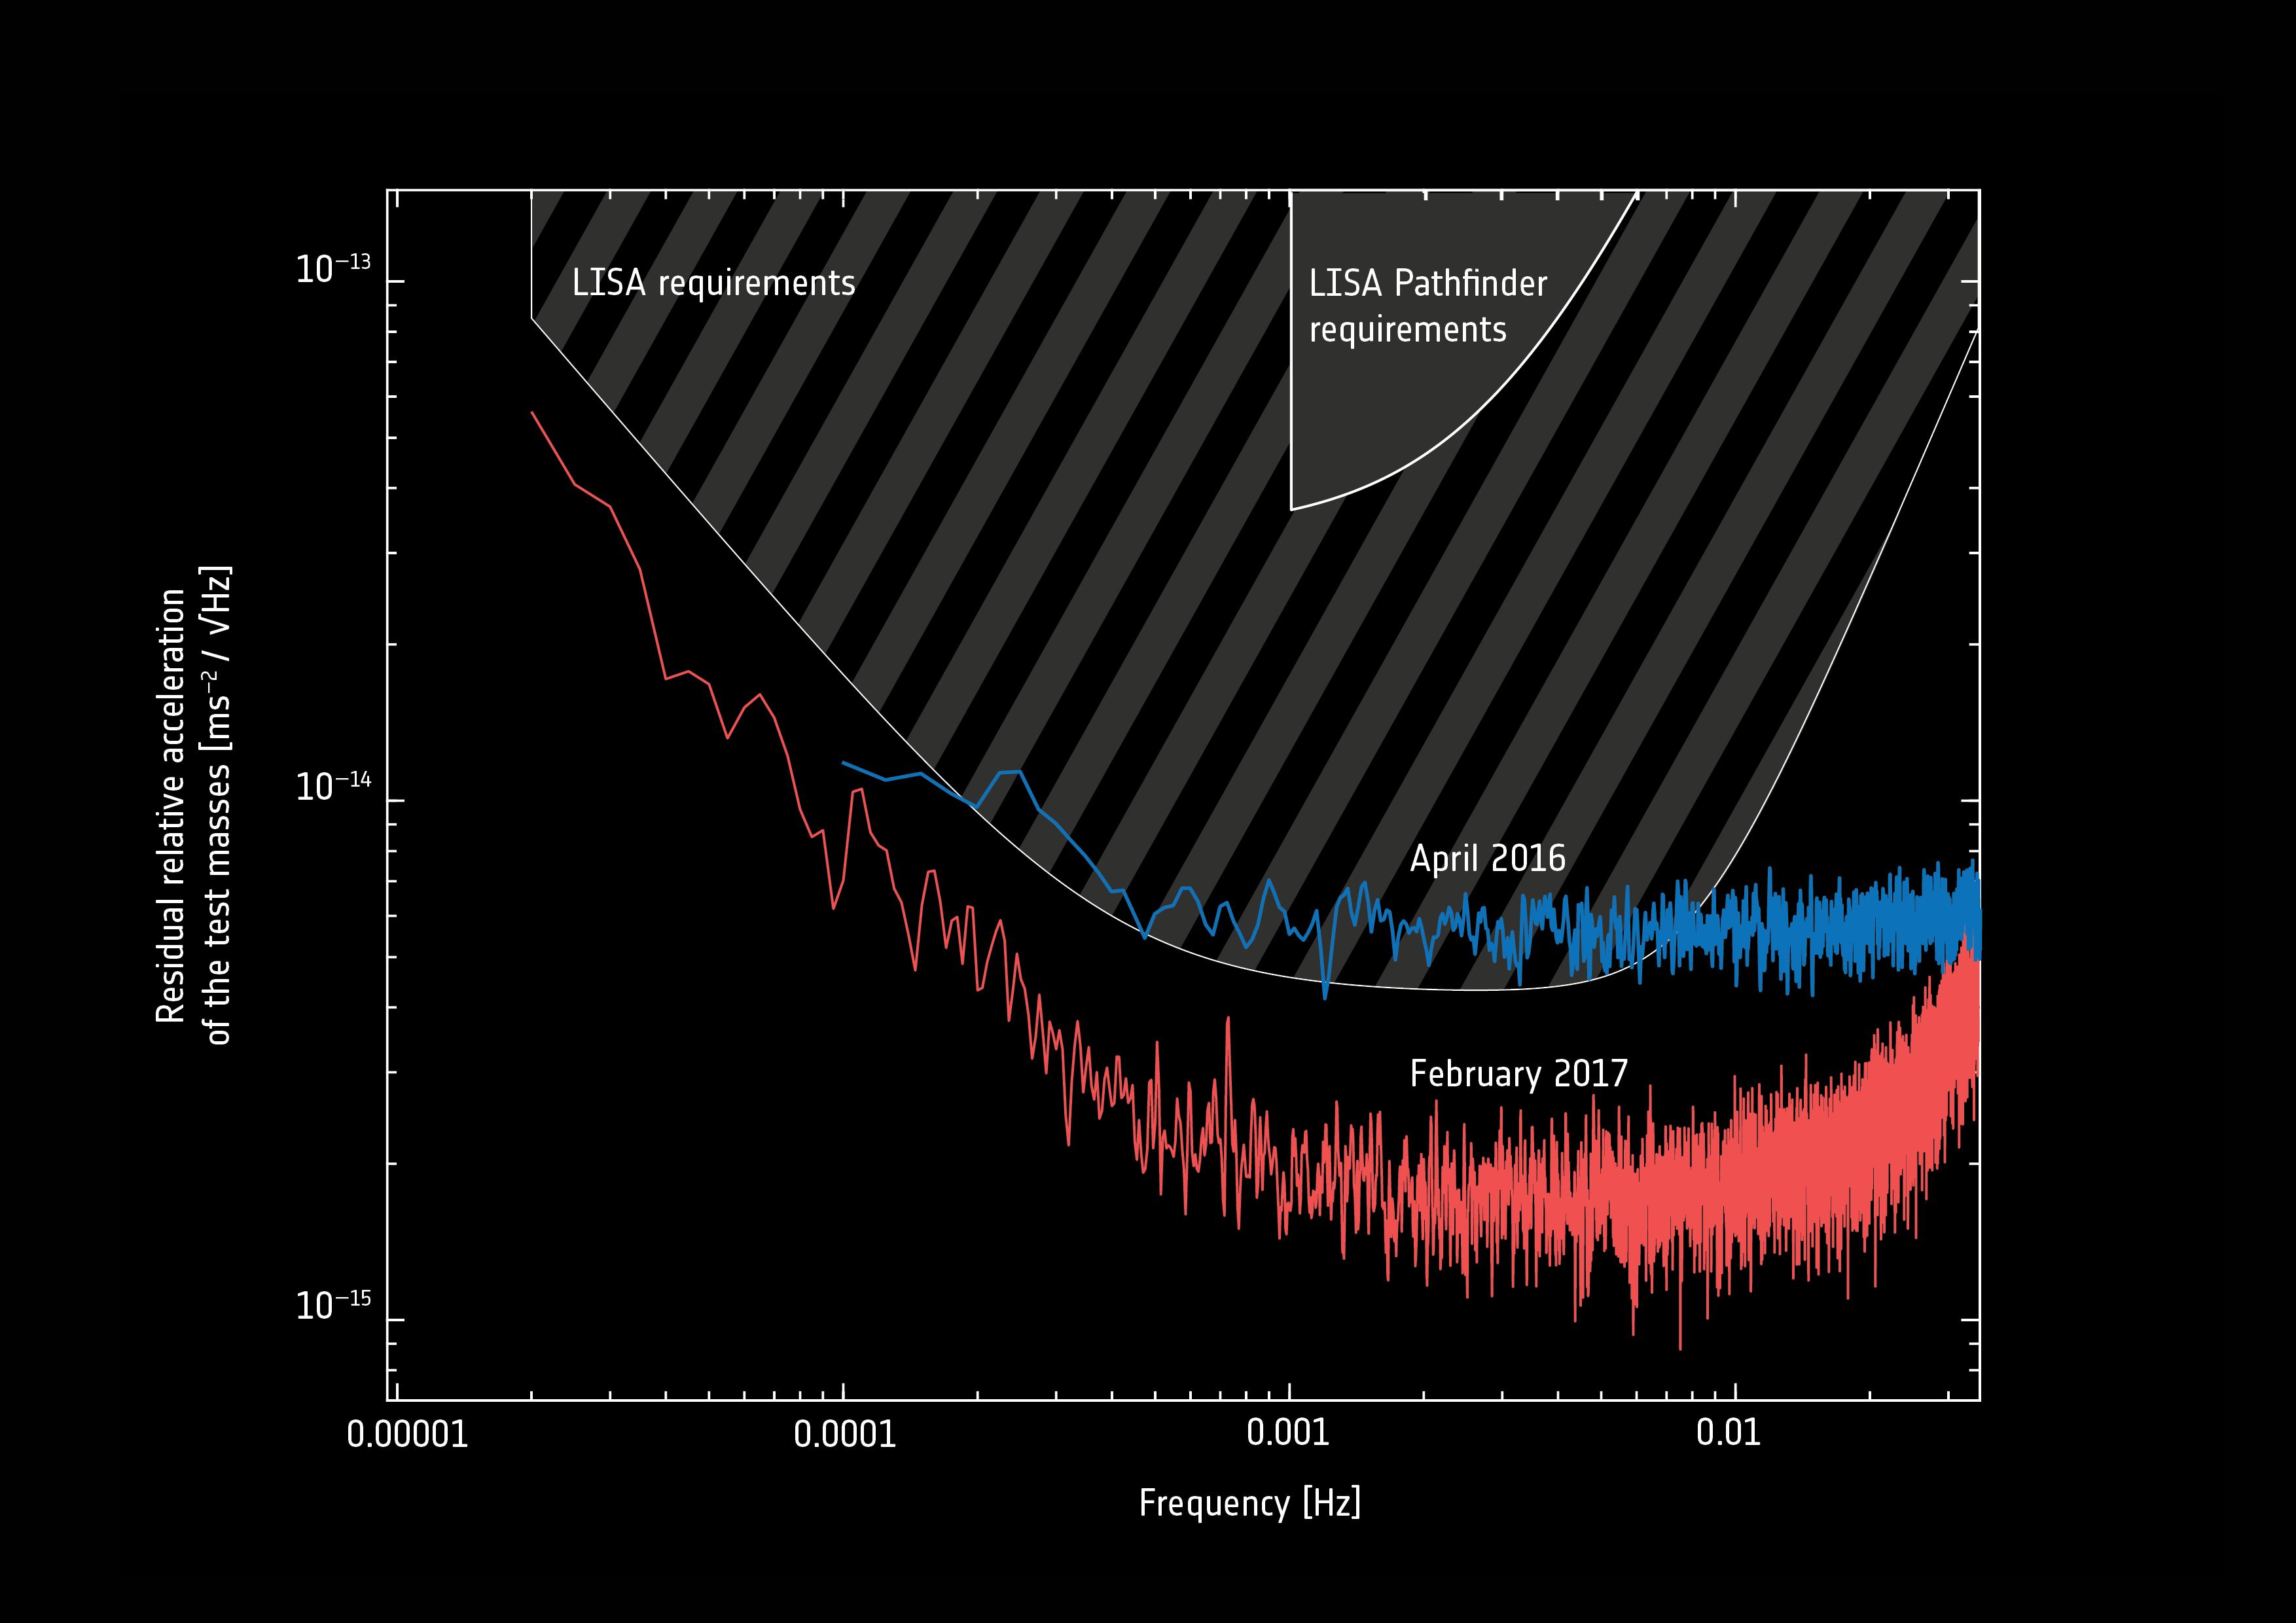 1567215051762-LISA_Pathfinder_results_analysis_1_20180205.jpg